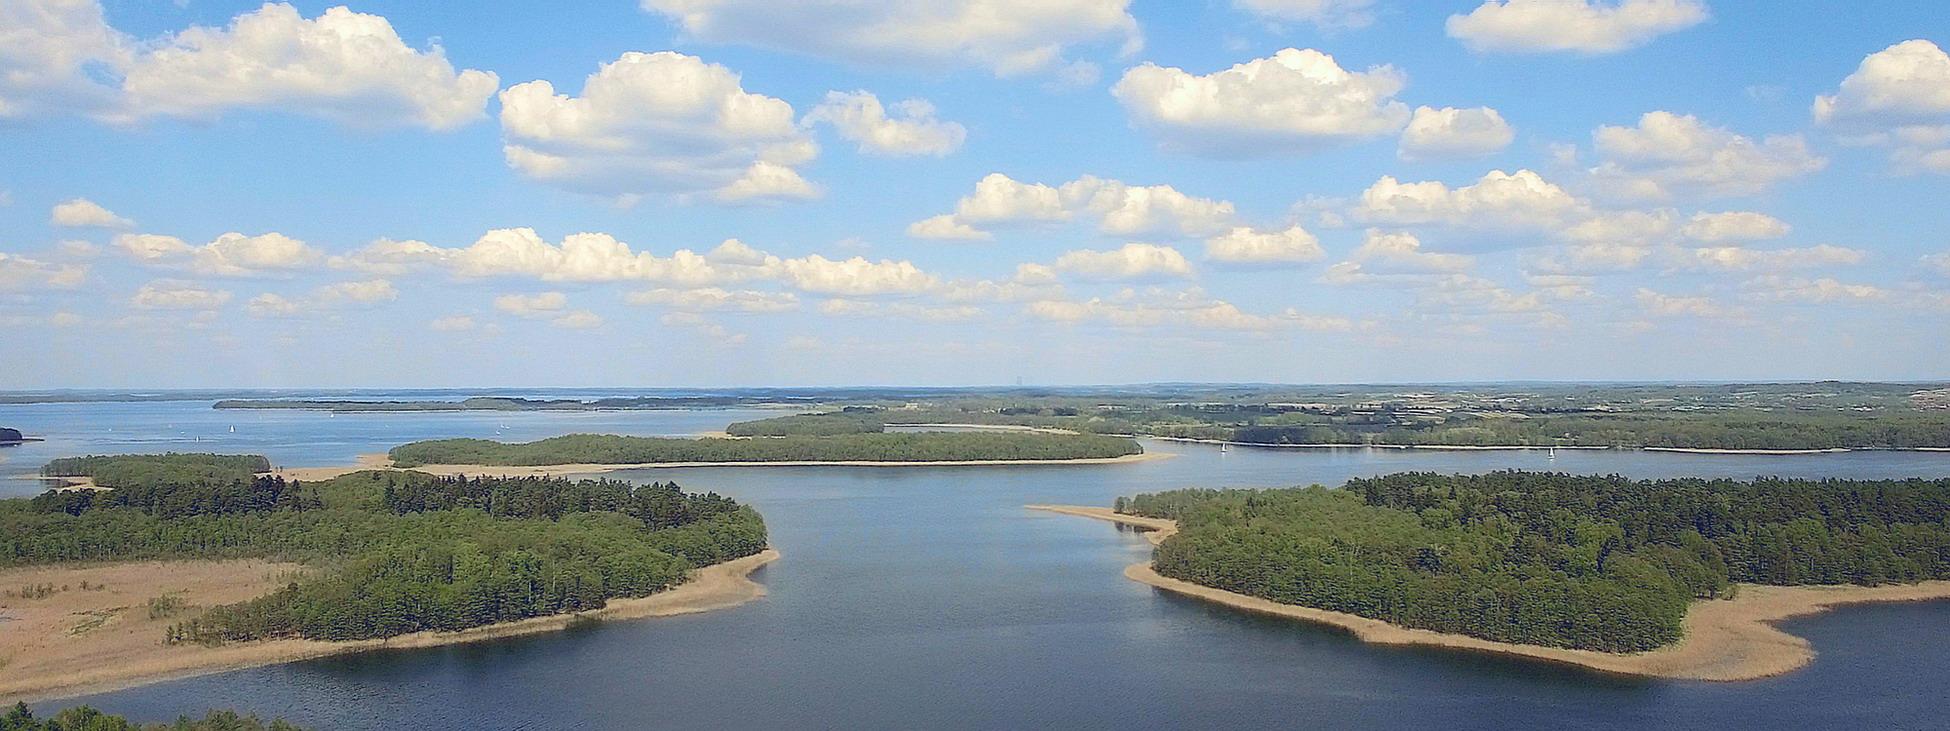 Panoramabild Masurische Seenplatte, Hausboot und Segelboot Urlaub in Masuren, Polen